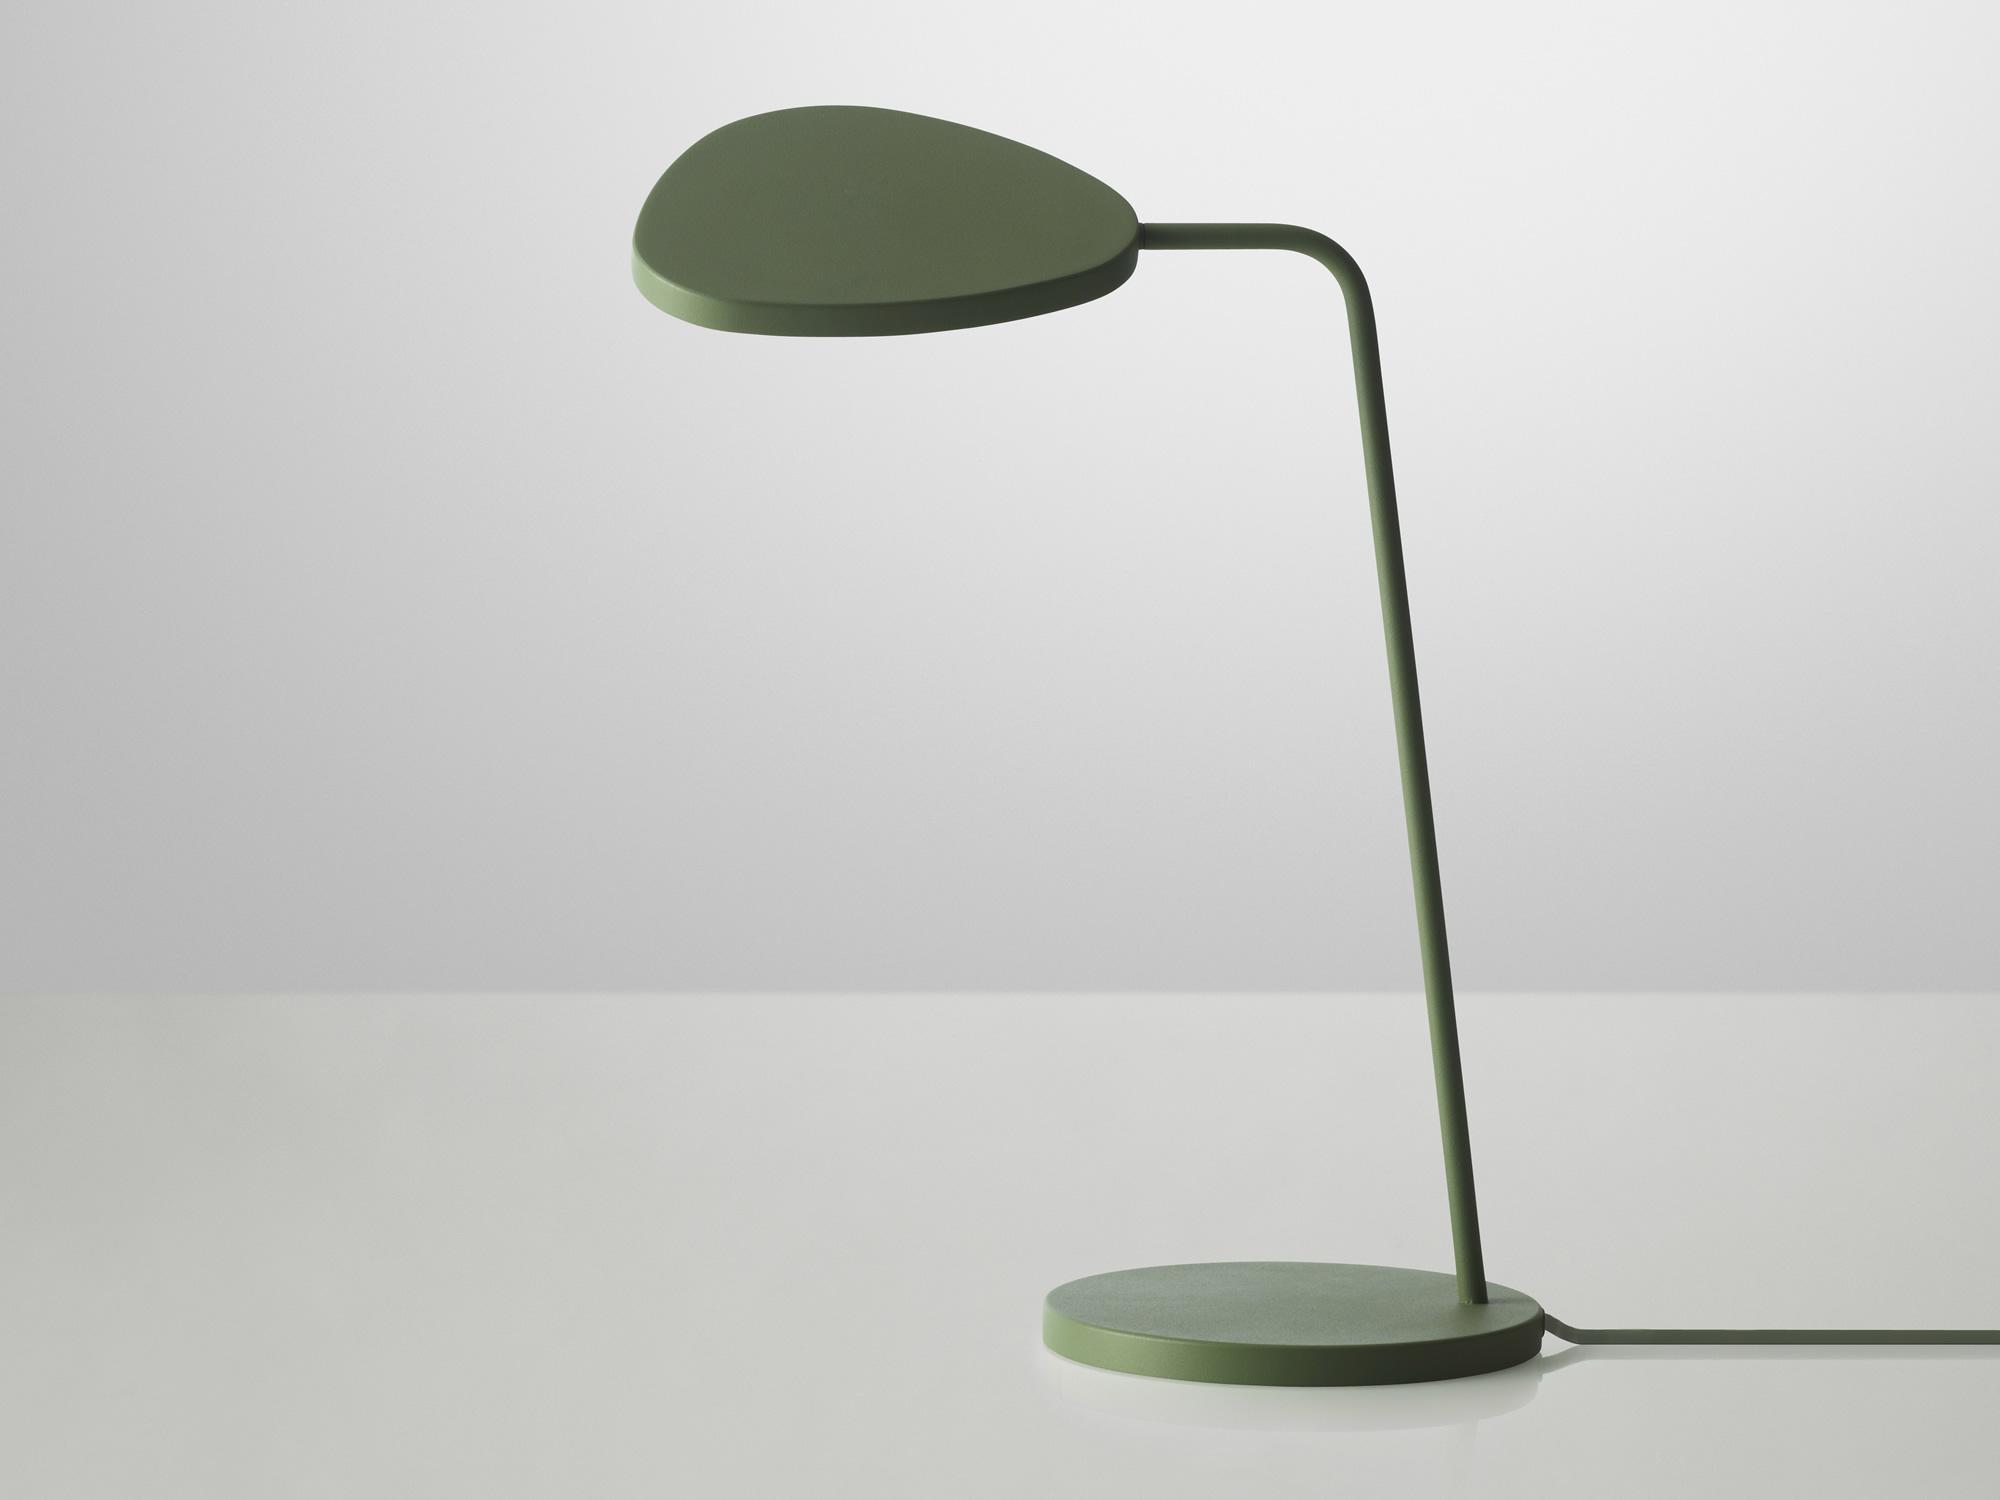 Leaf Lamp By Muuto Sohomod Blog